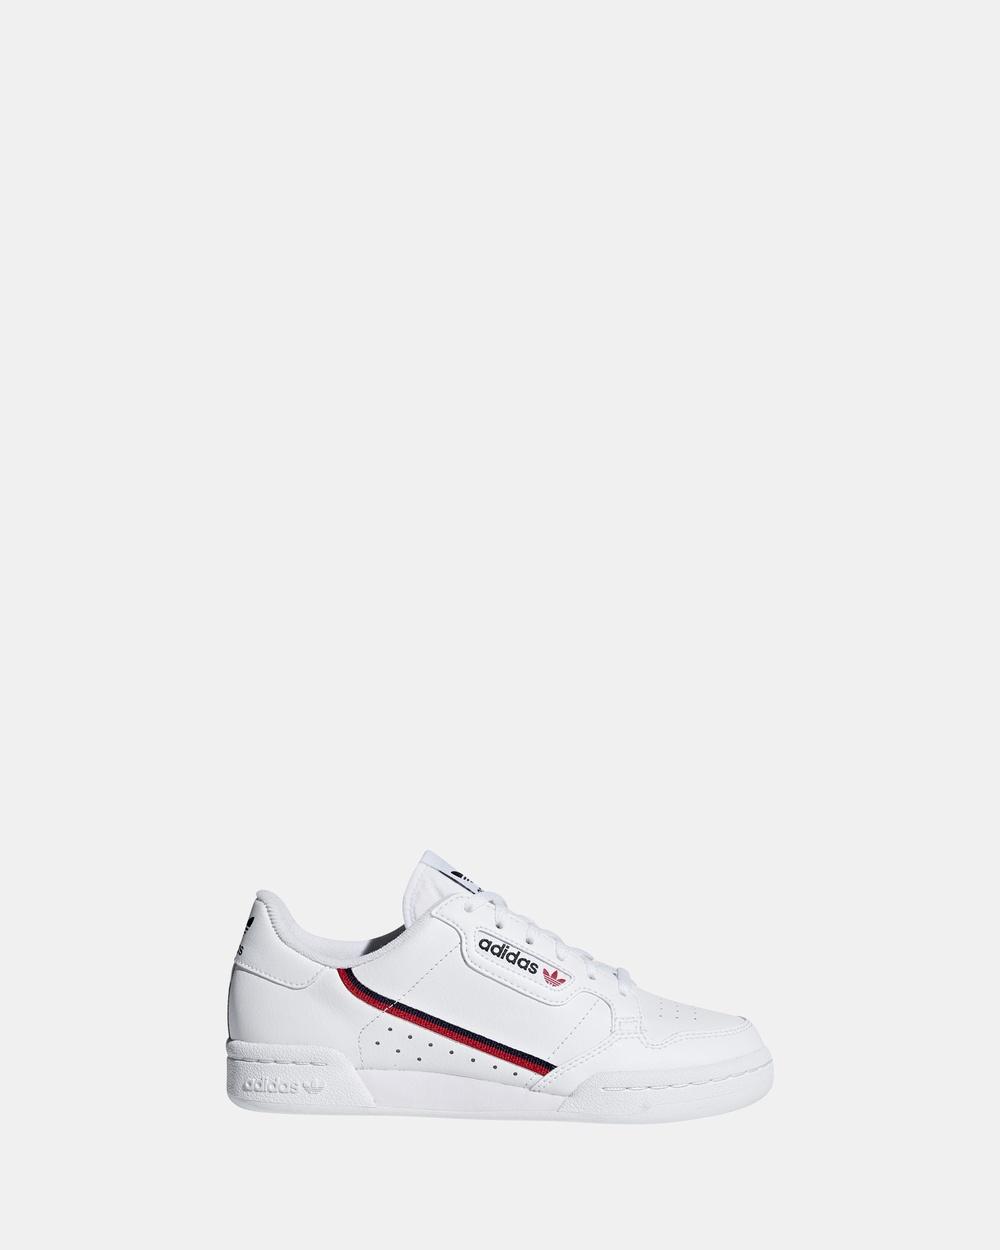 adidas Originals Continental 80 Grade School Sneakers White/Red/Navy Australia